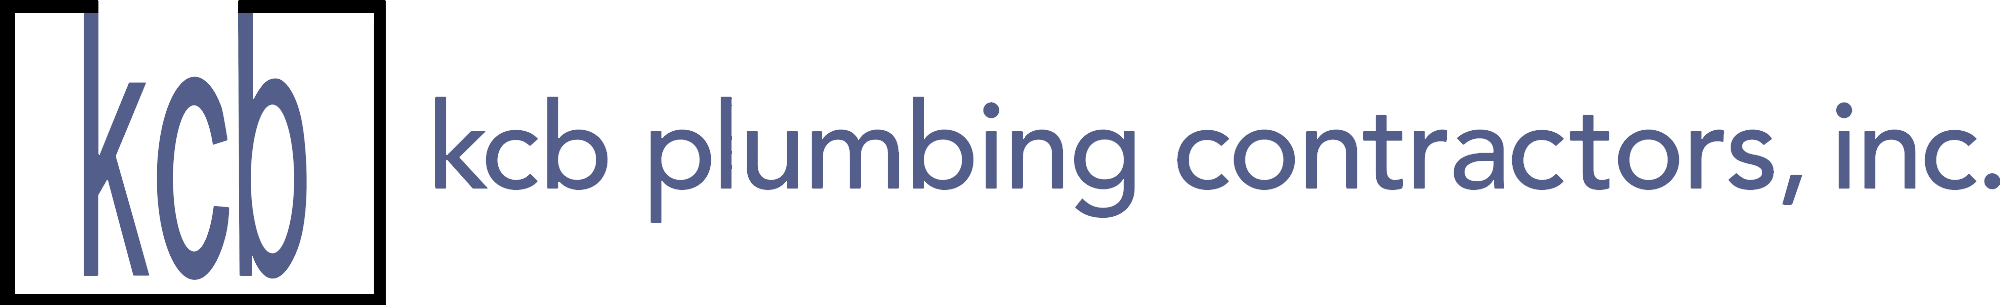 Plumbing contractor and plumbing service Logo